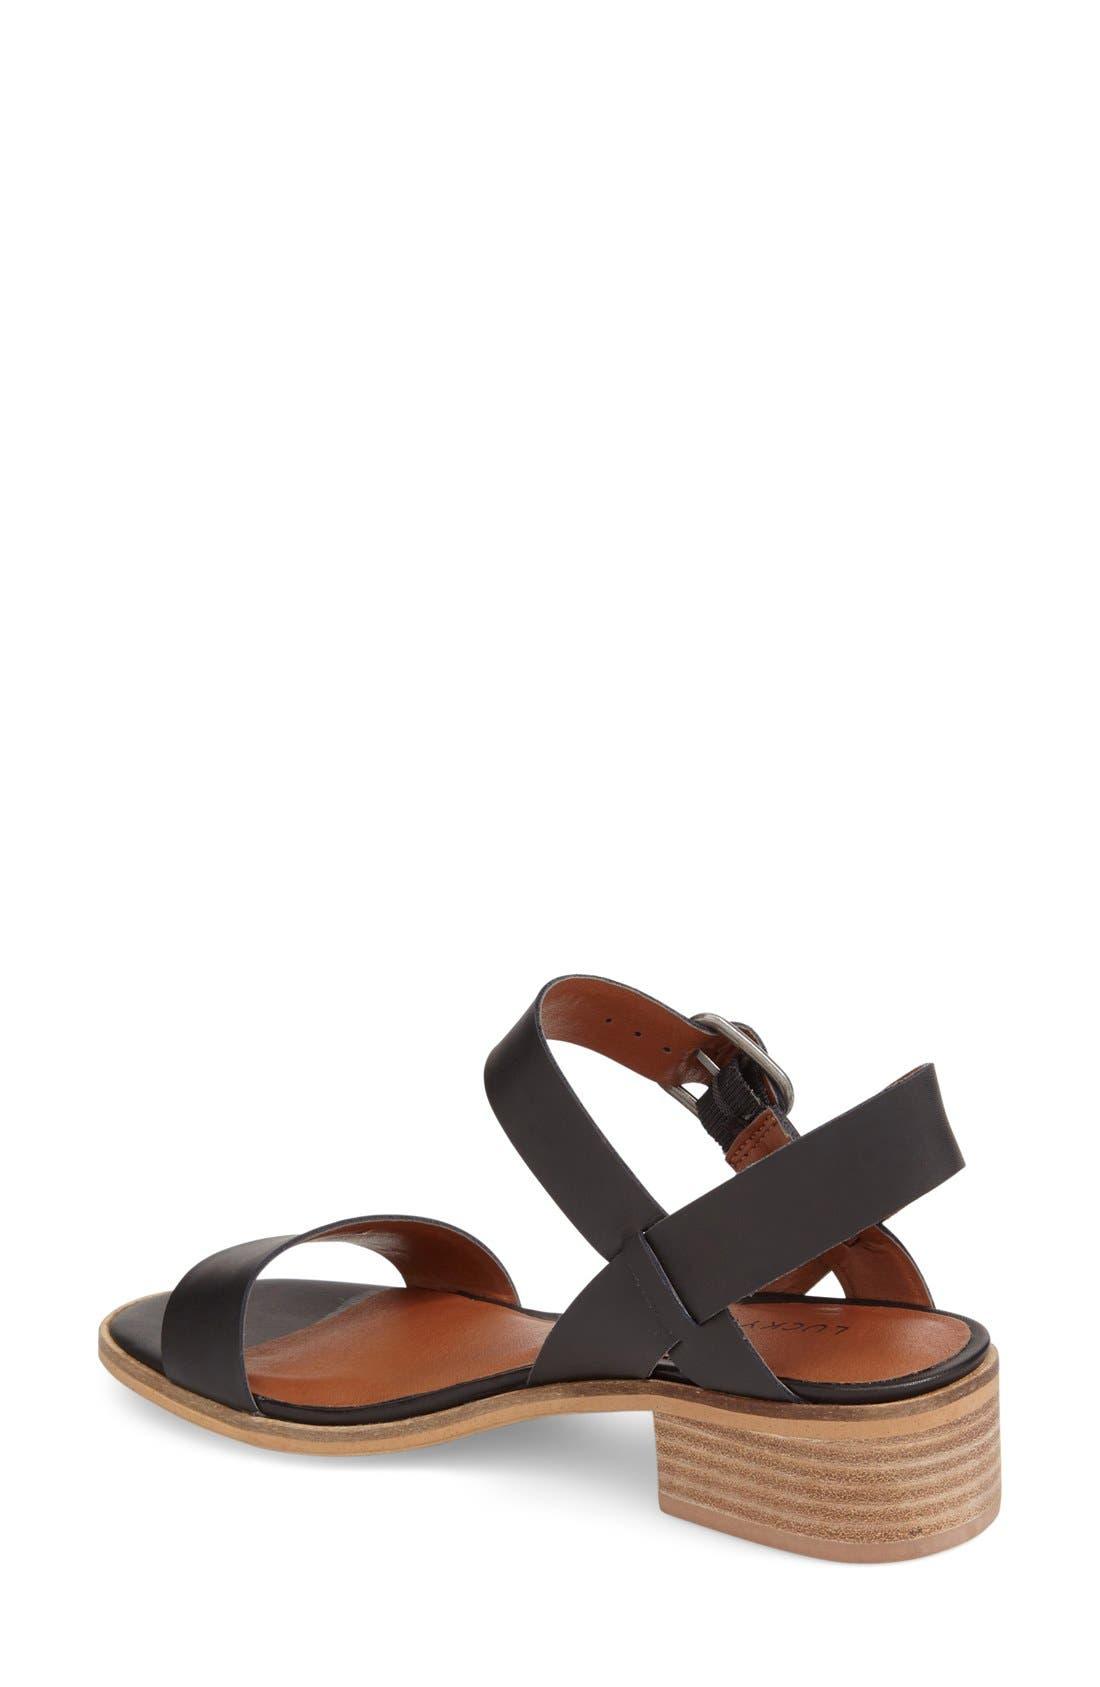 Alternate Image 2  - Lucky Brand 'Toni' Stacked Heel Sandal (Women)